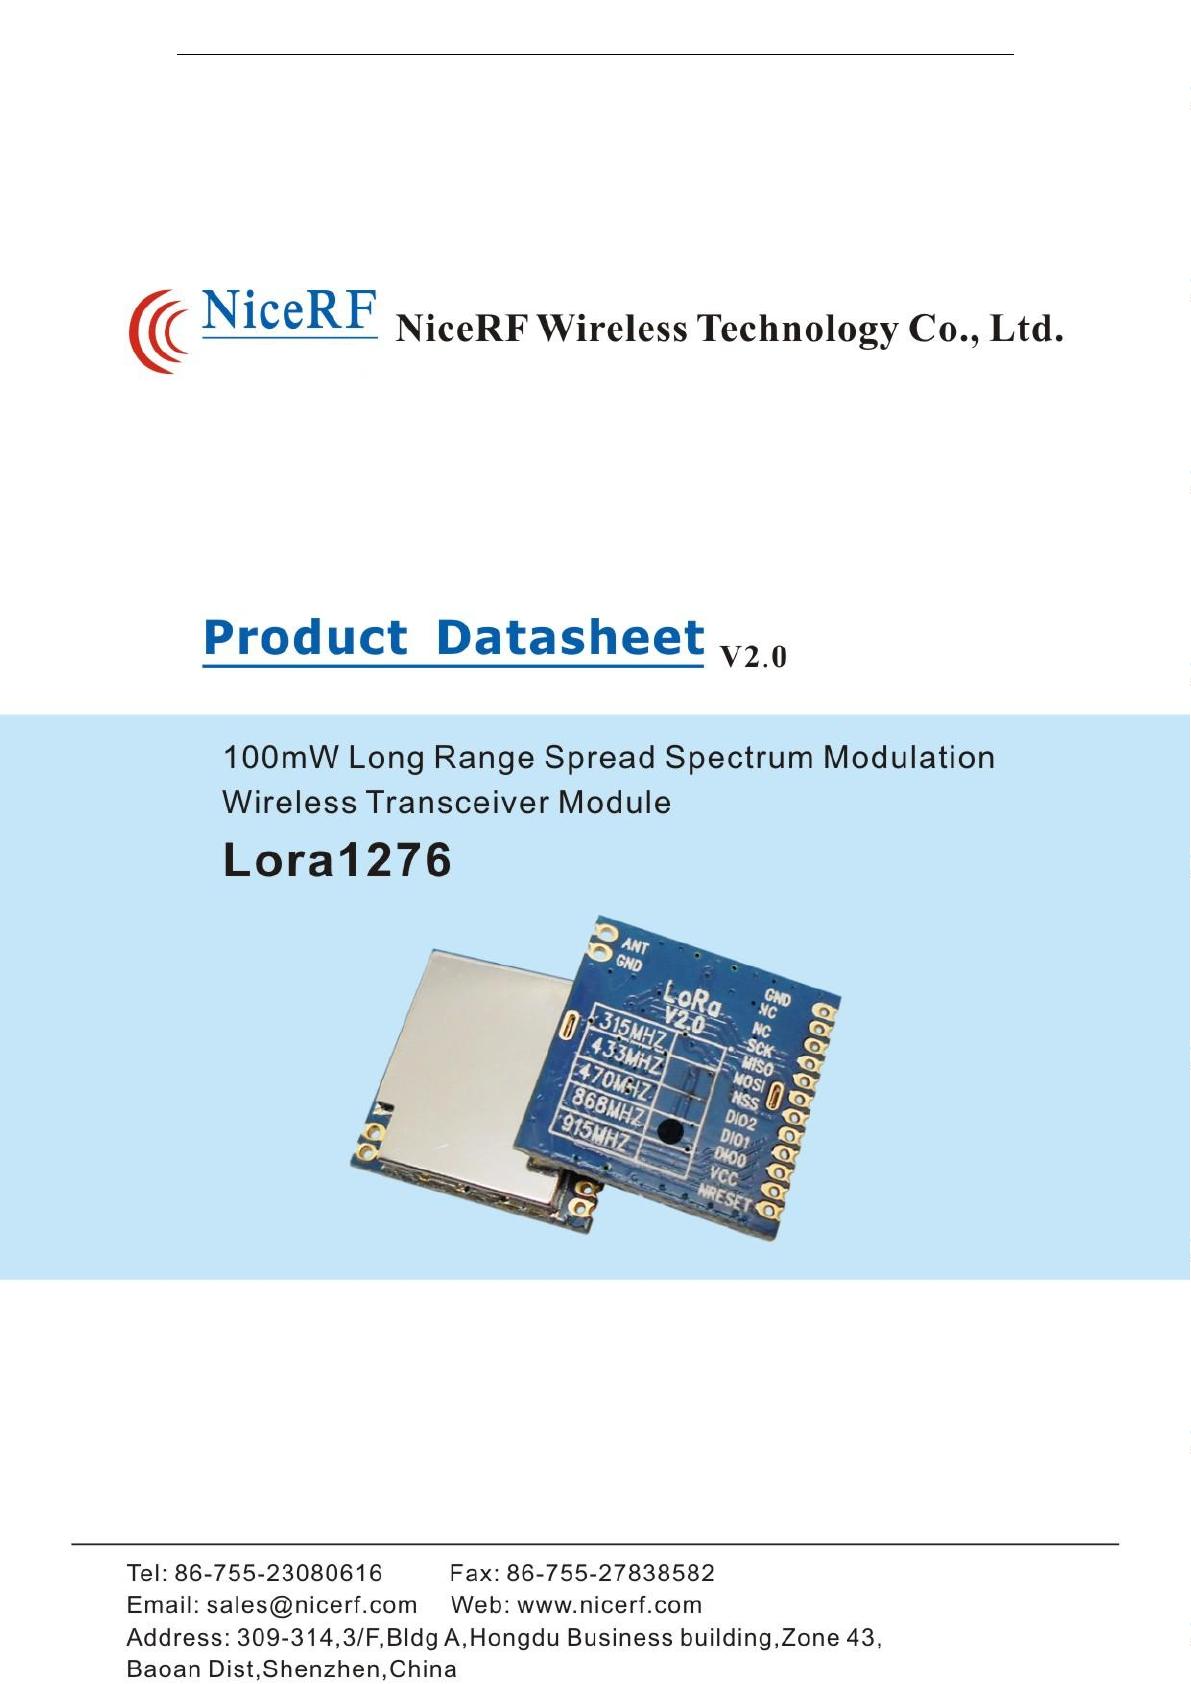 NiceRF Wireless Technology LORAV2 LORA V2 0-915 Wireless